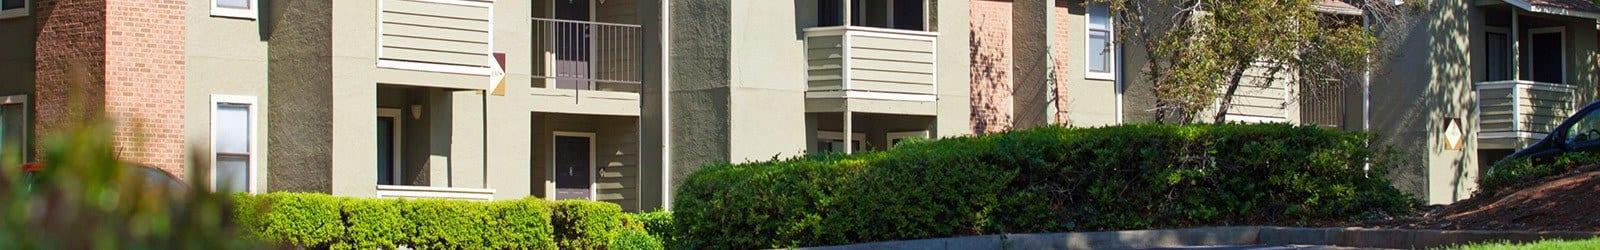 View of Atlanta, Georgia from Jasmine Woodlands luxury apartments